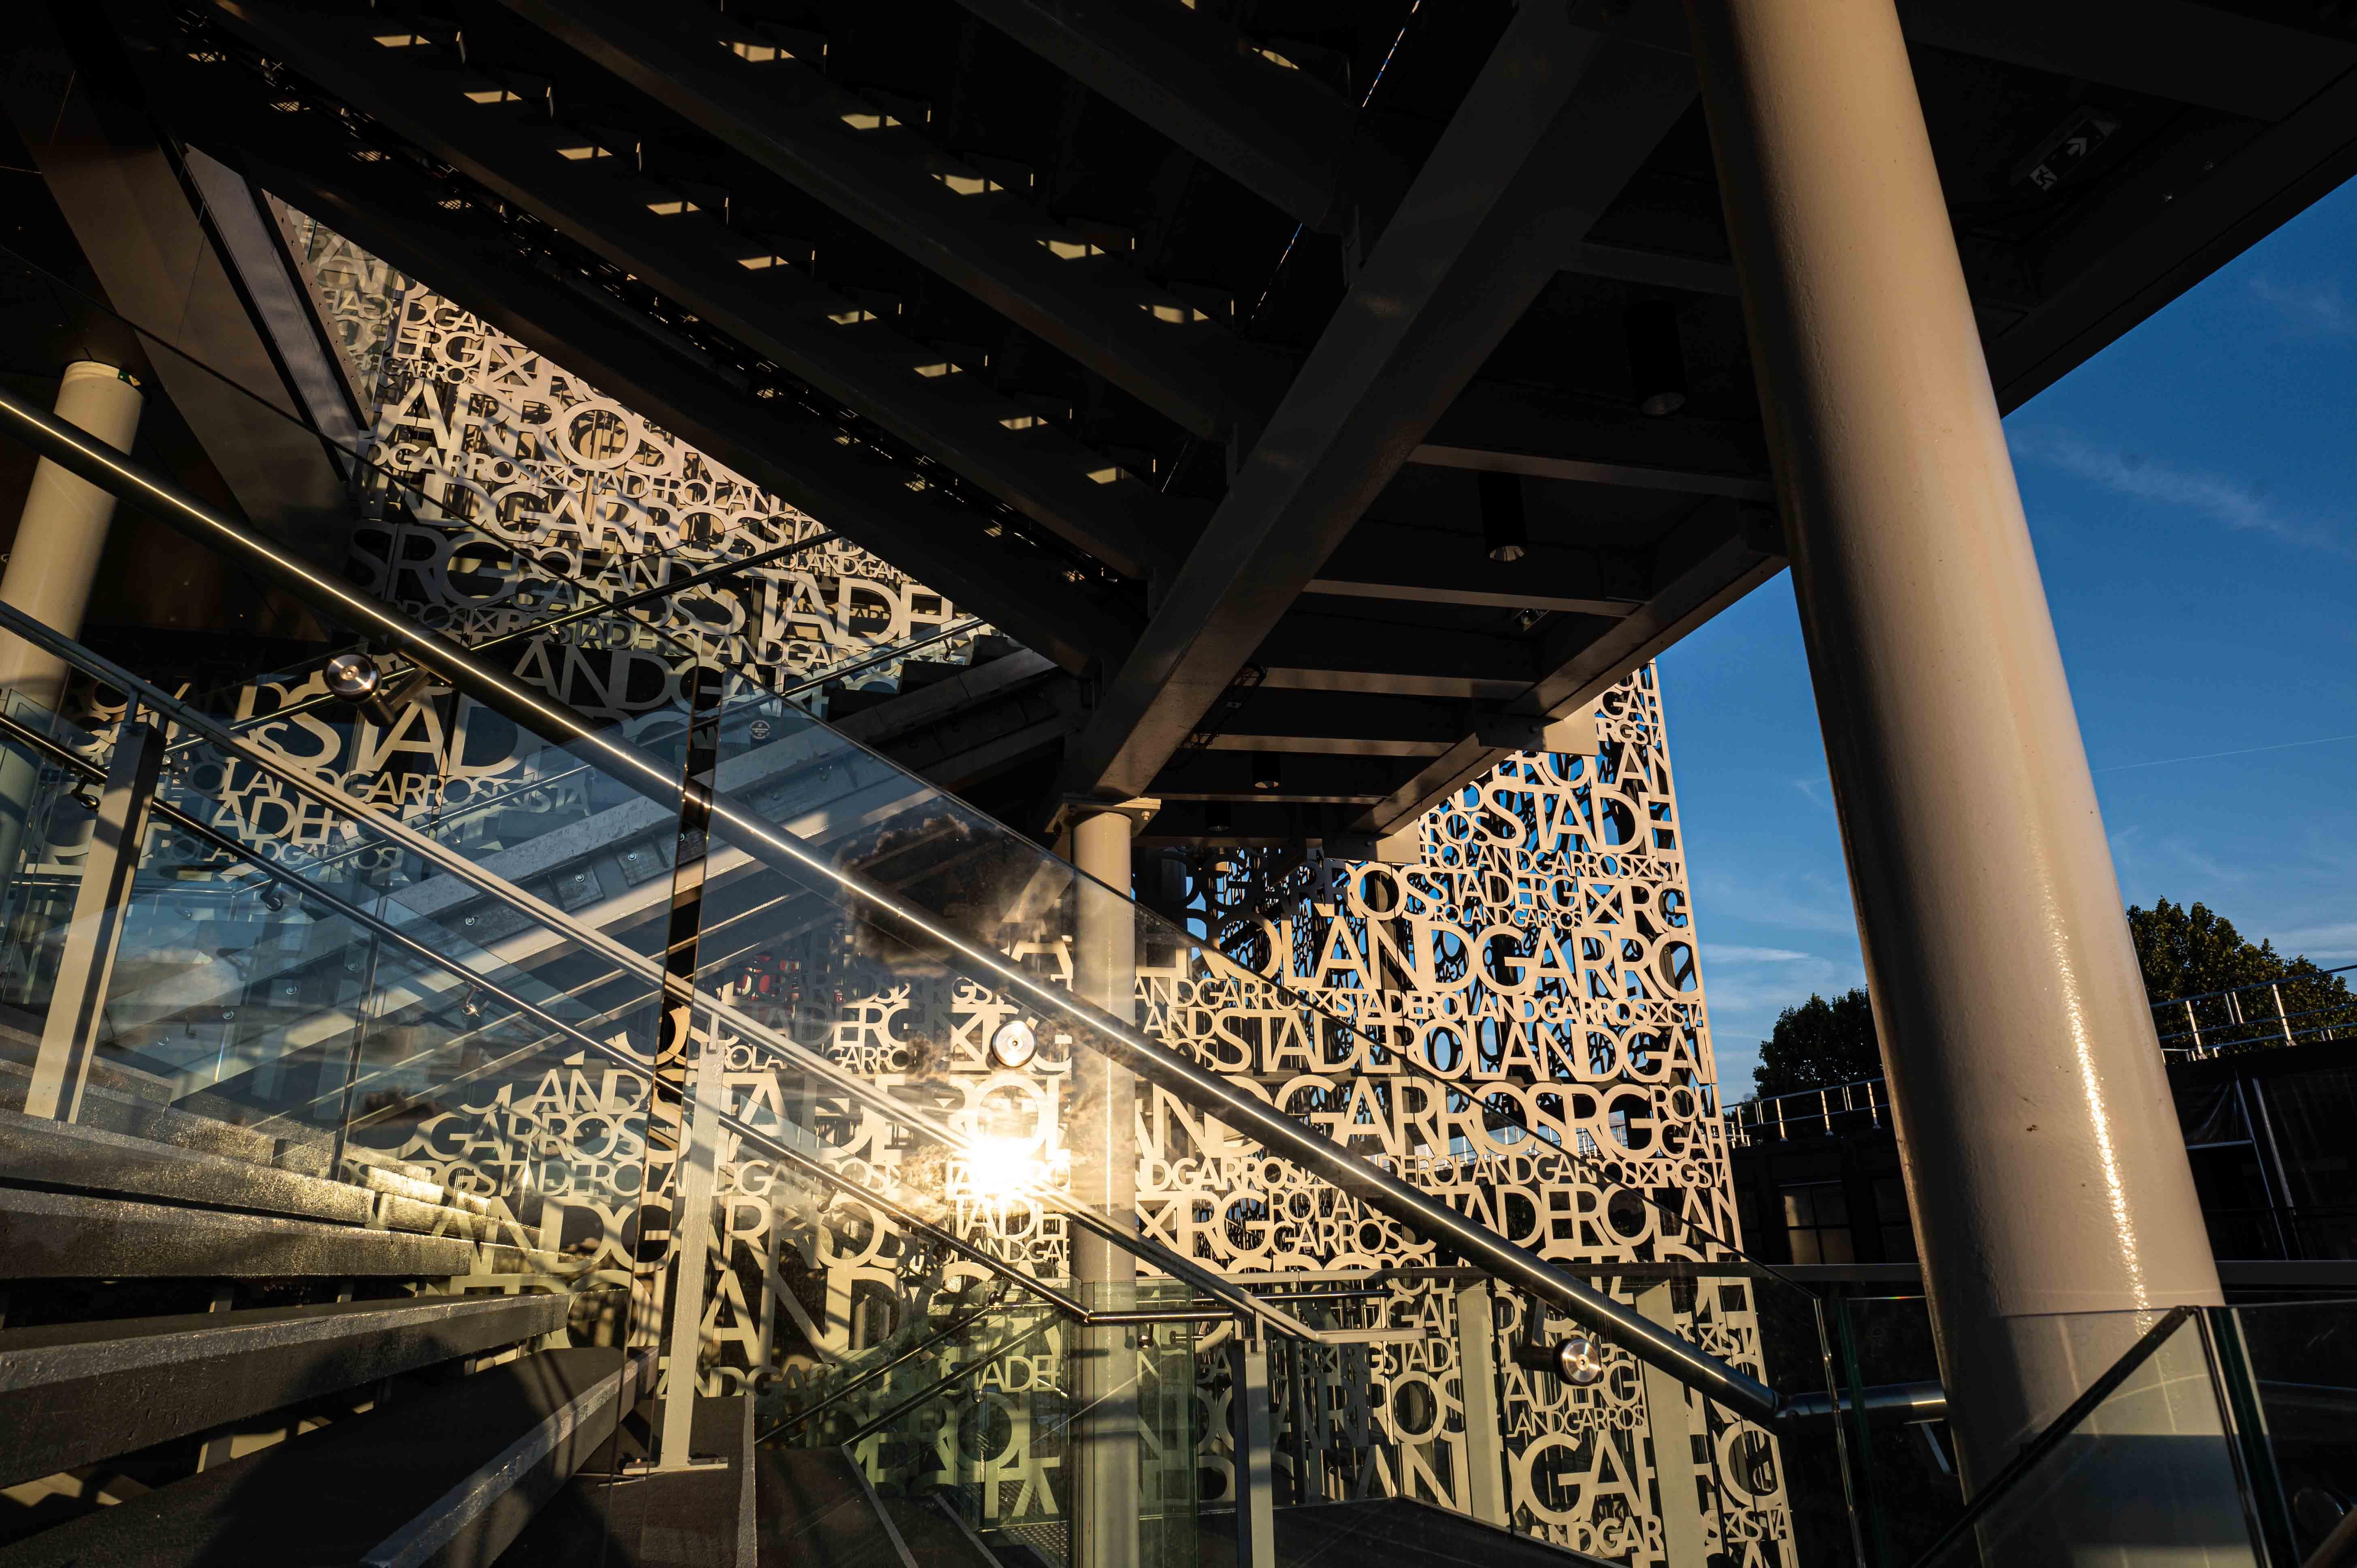 Rays of light roland-Garros stadium September 2020